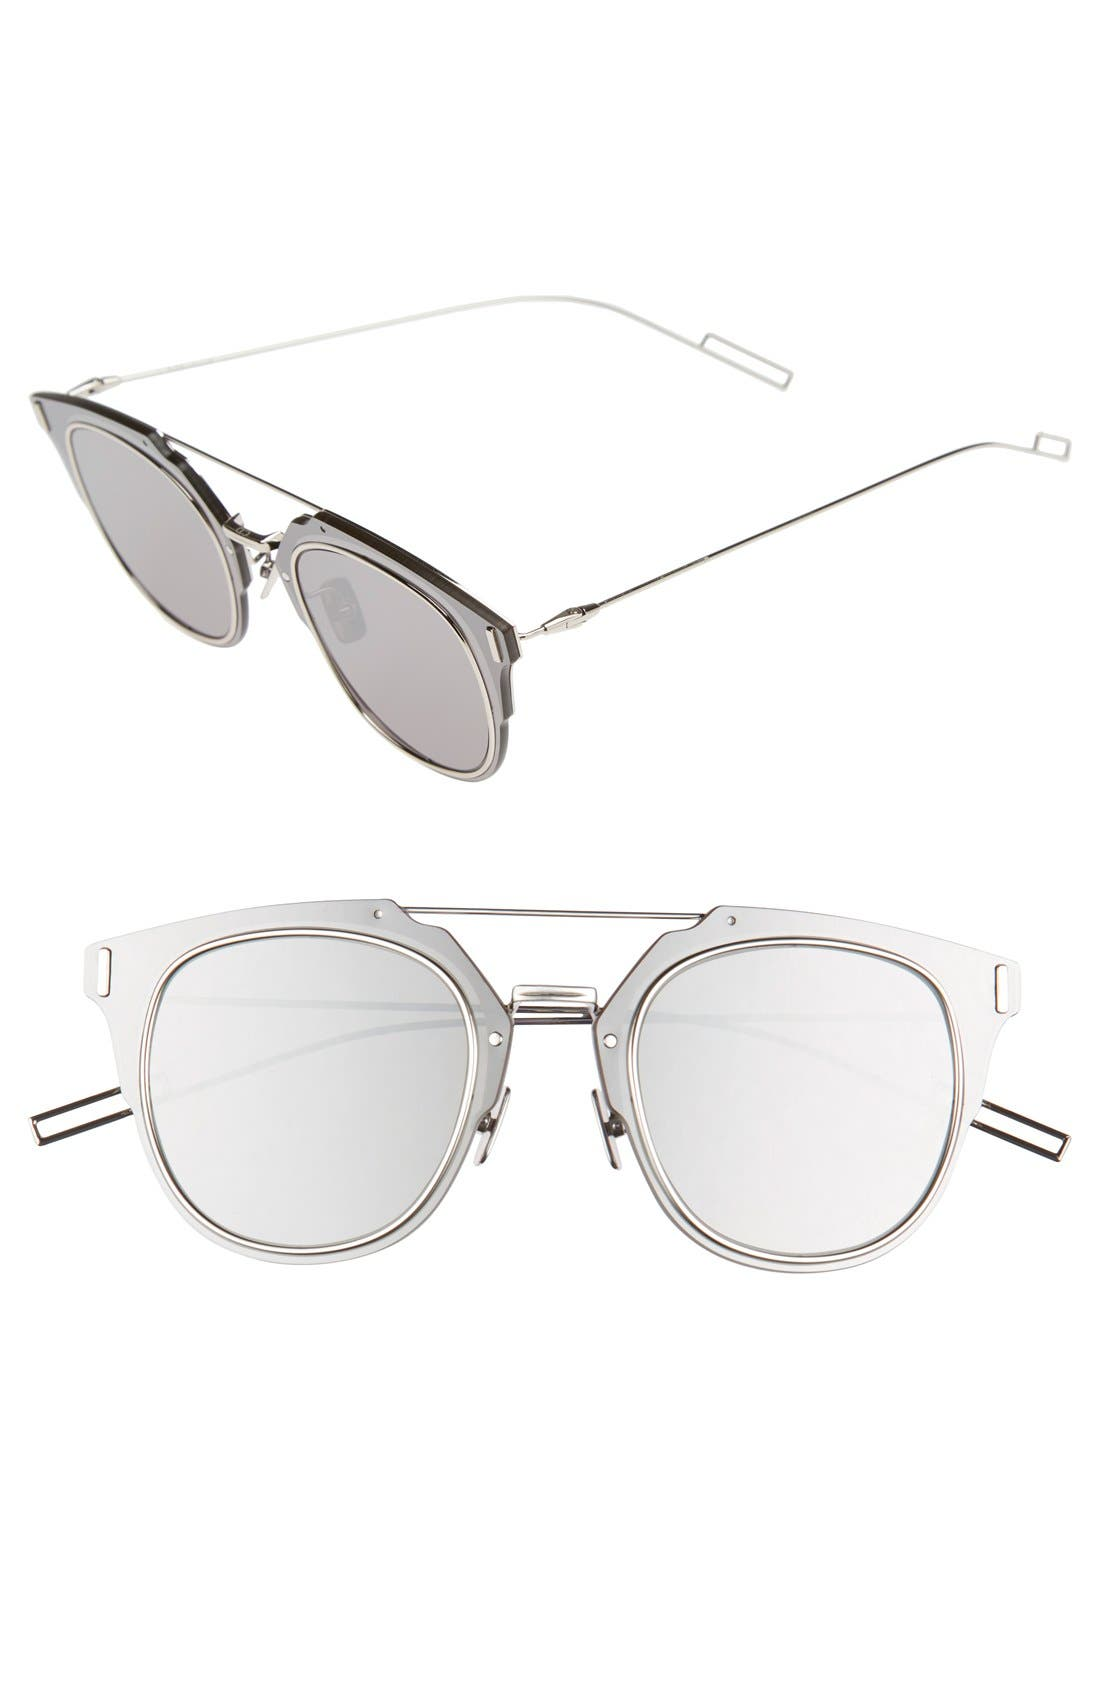 Dior Homme 'Composit 1.0S' 62mm Metal Shield Sunglasses